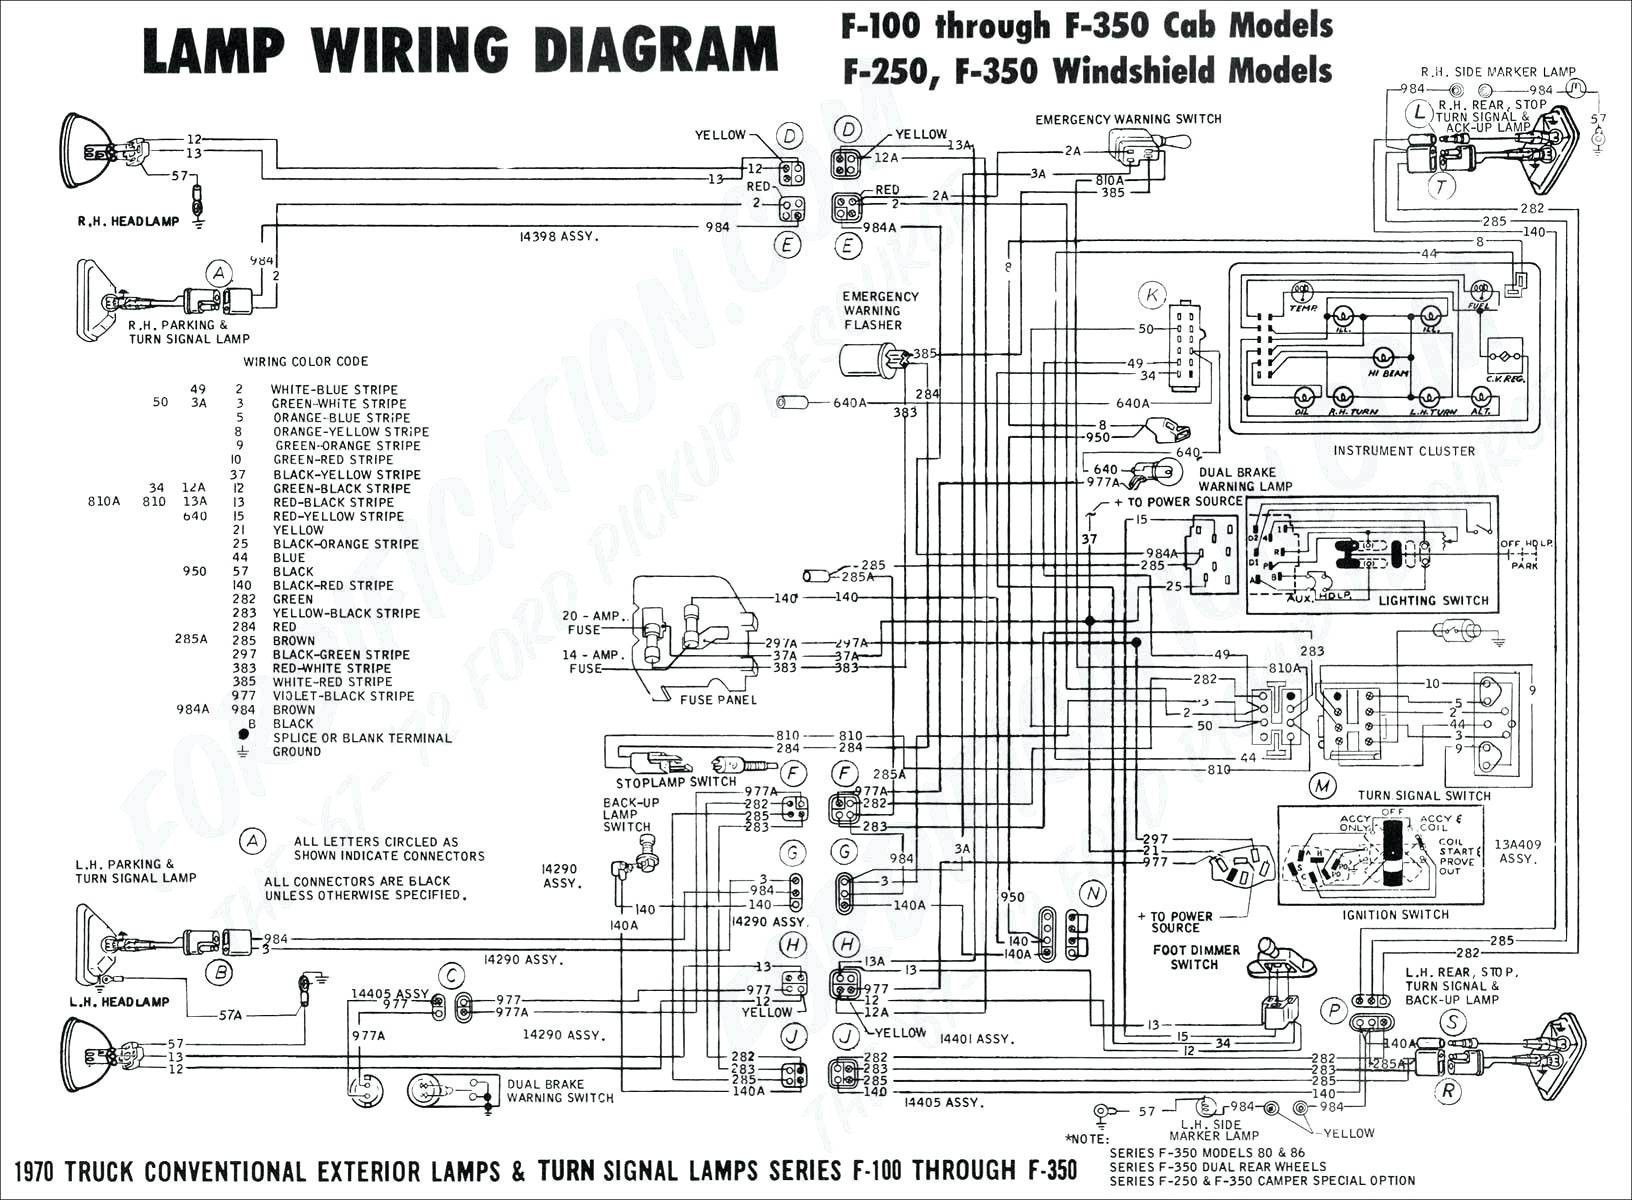 Cb400 Wiring Diagram Honda Valkyrie Turn Signal Flasher Wiring Diagram Worksheet and Of Cb400 Wiring Diagram